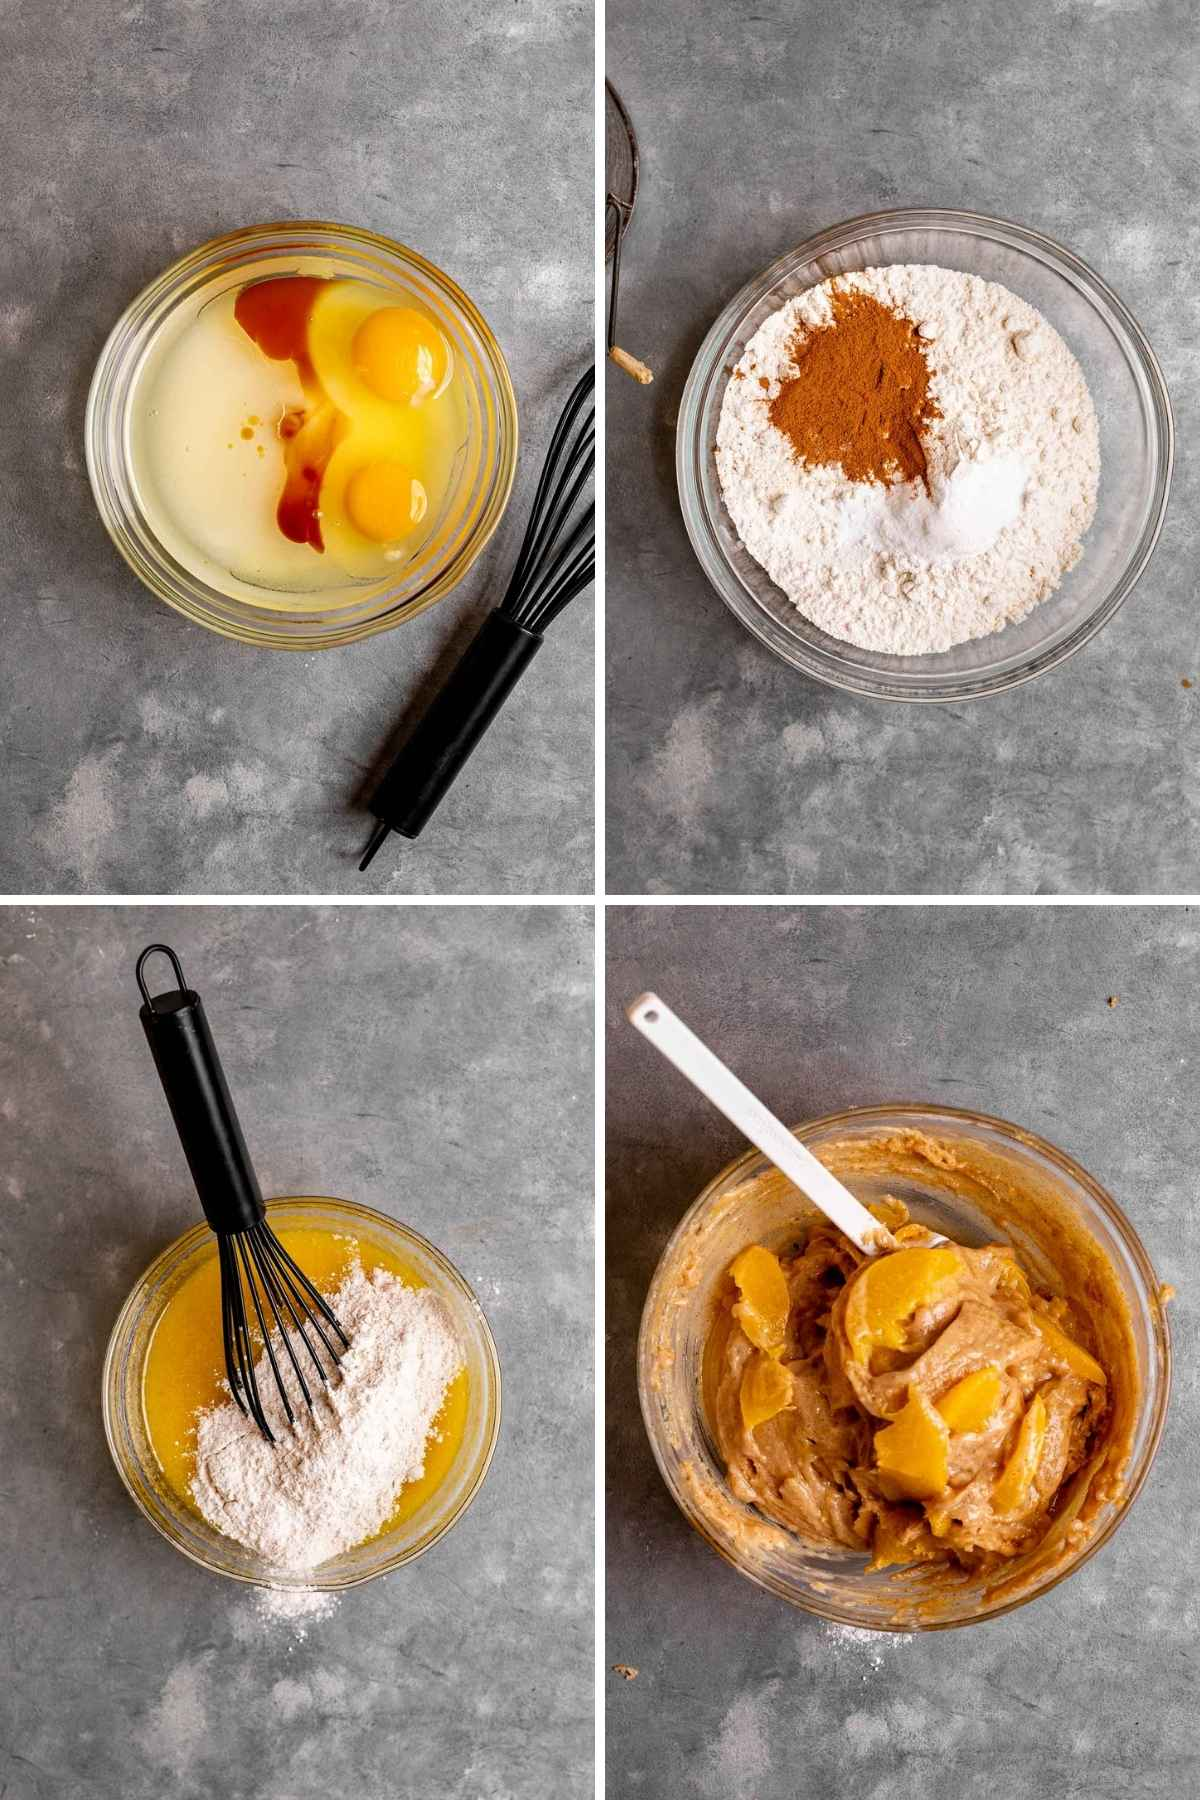 Collage of prep steps for Cinnamon Peach Bread